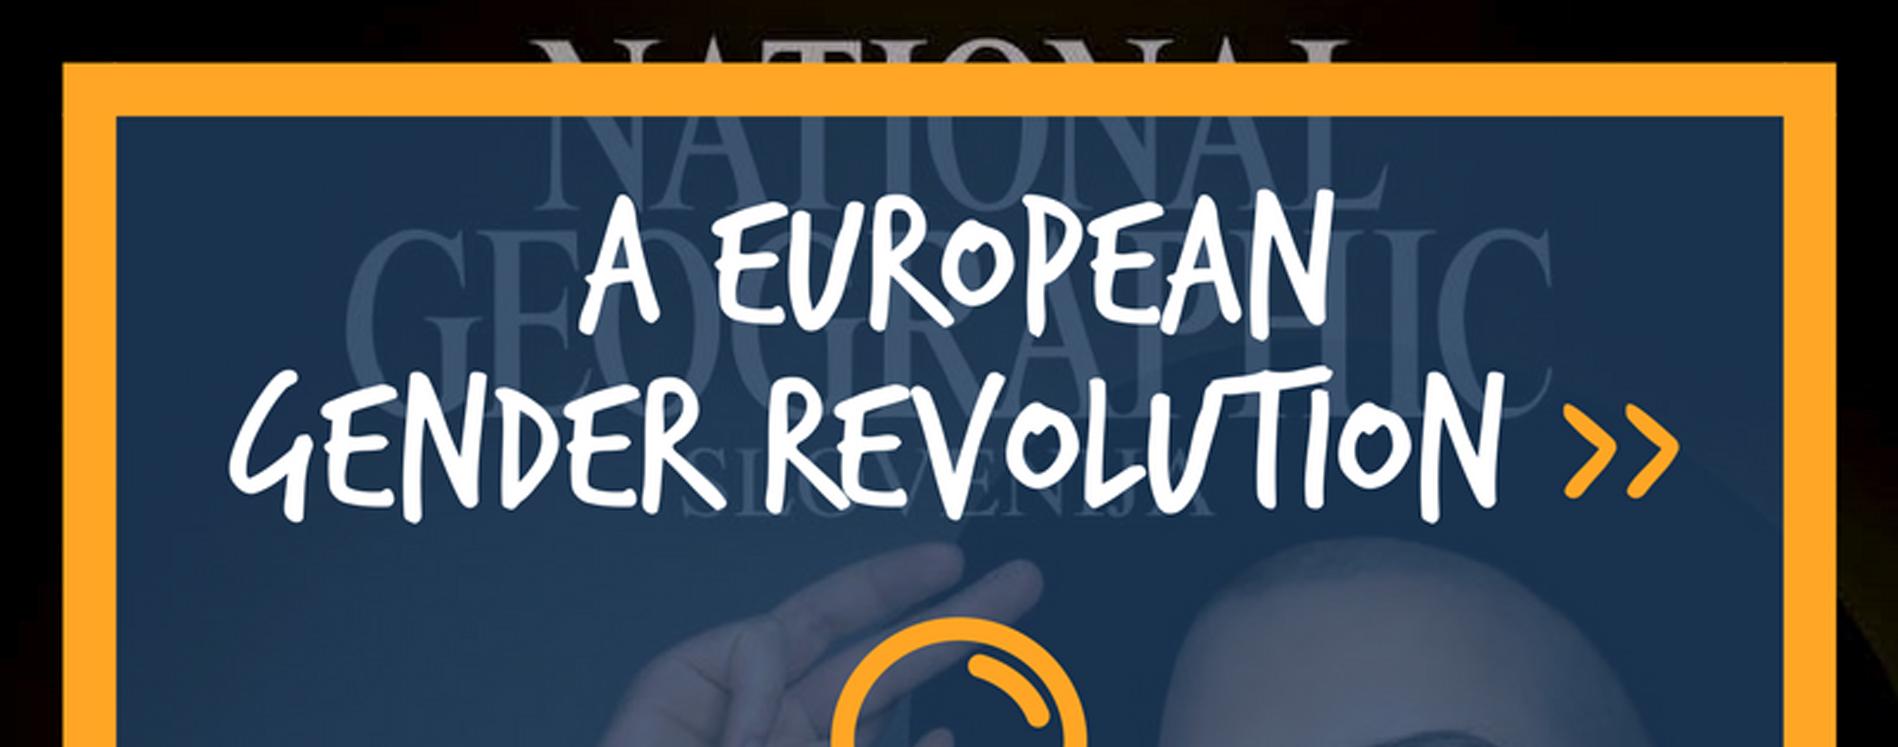 european gener revoltion